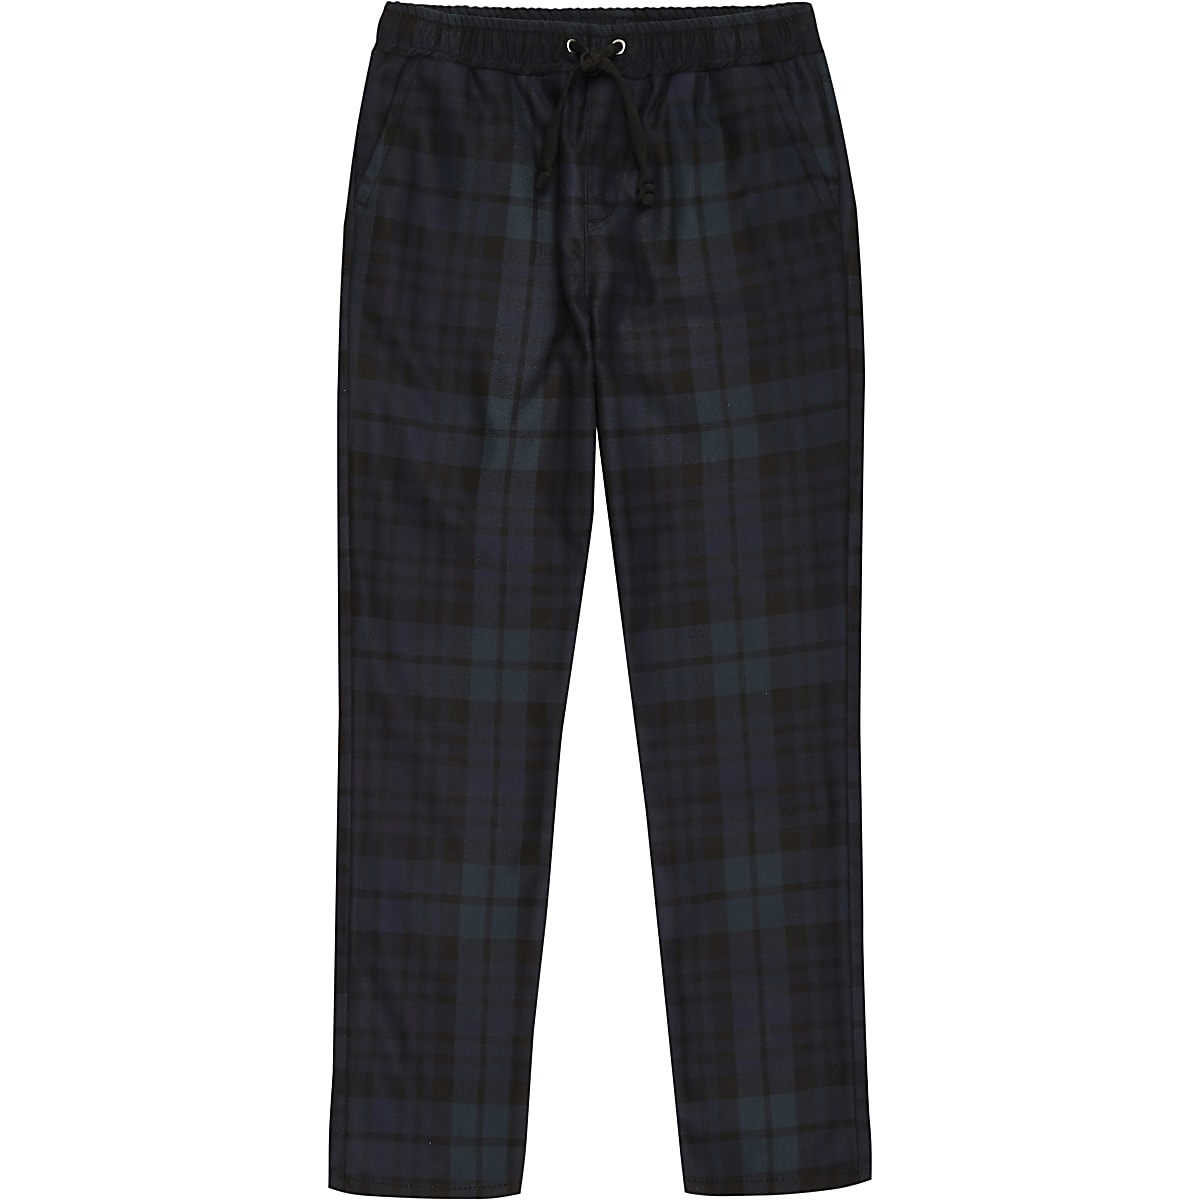 Boys navy tartan check trousers